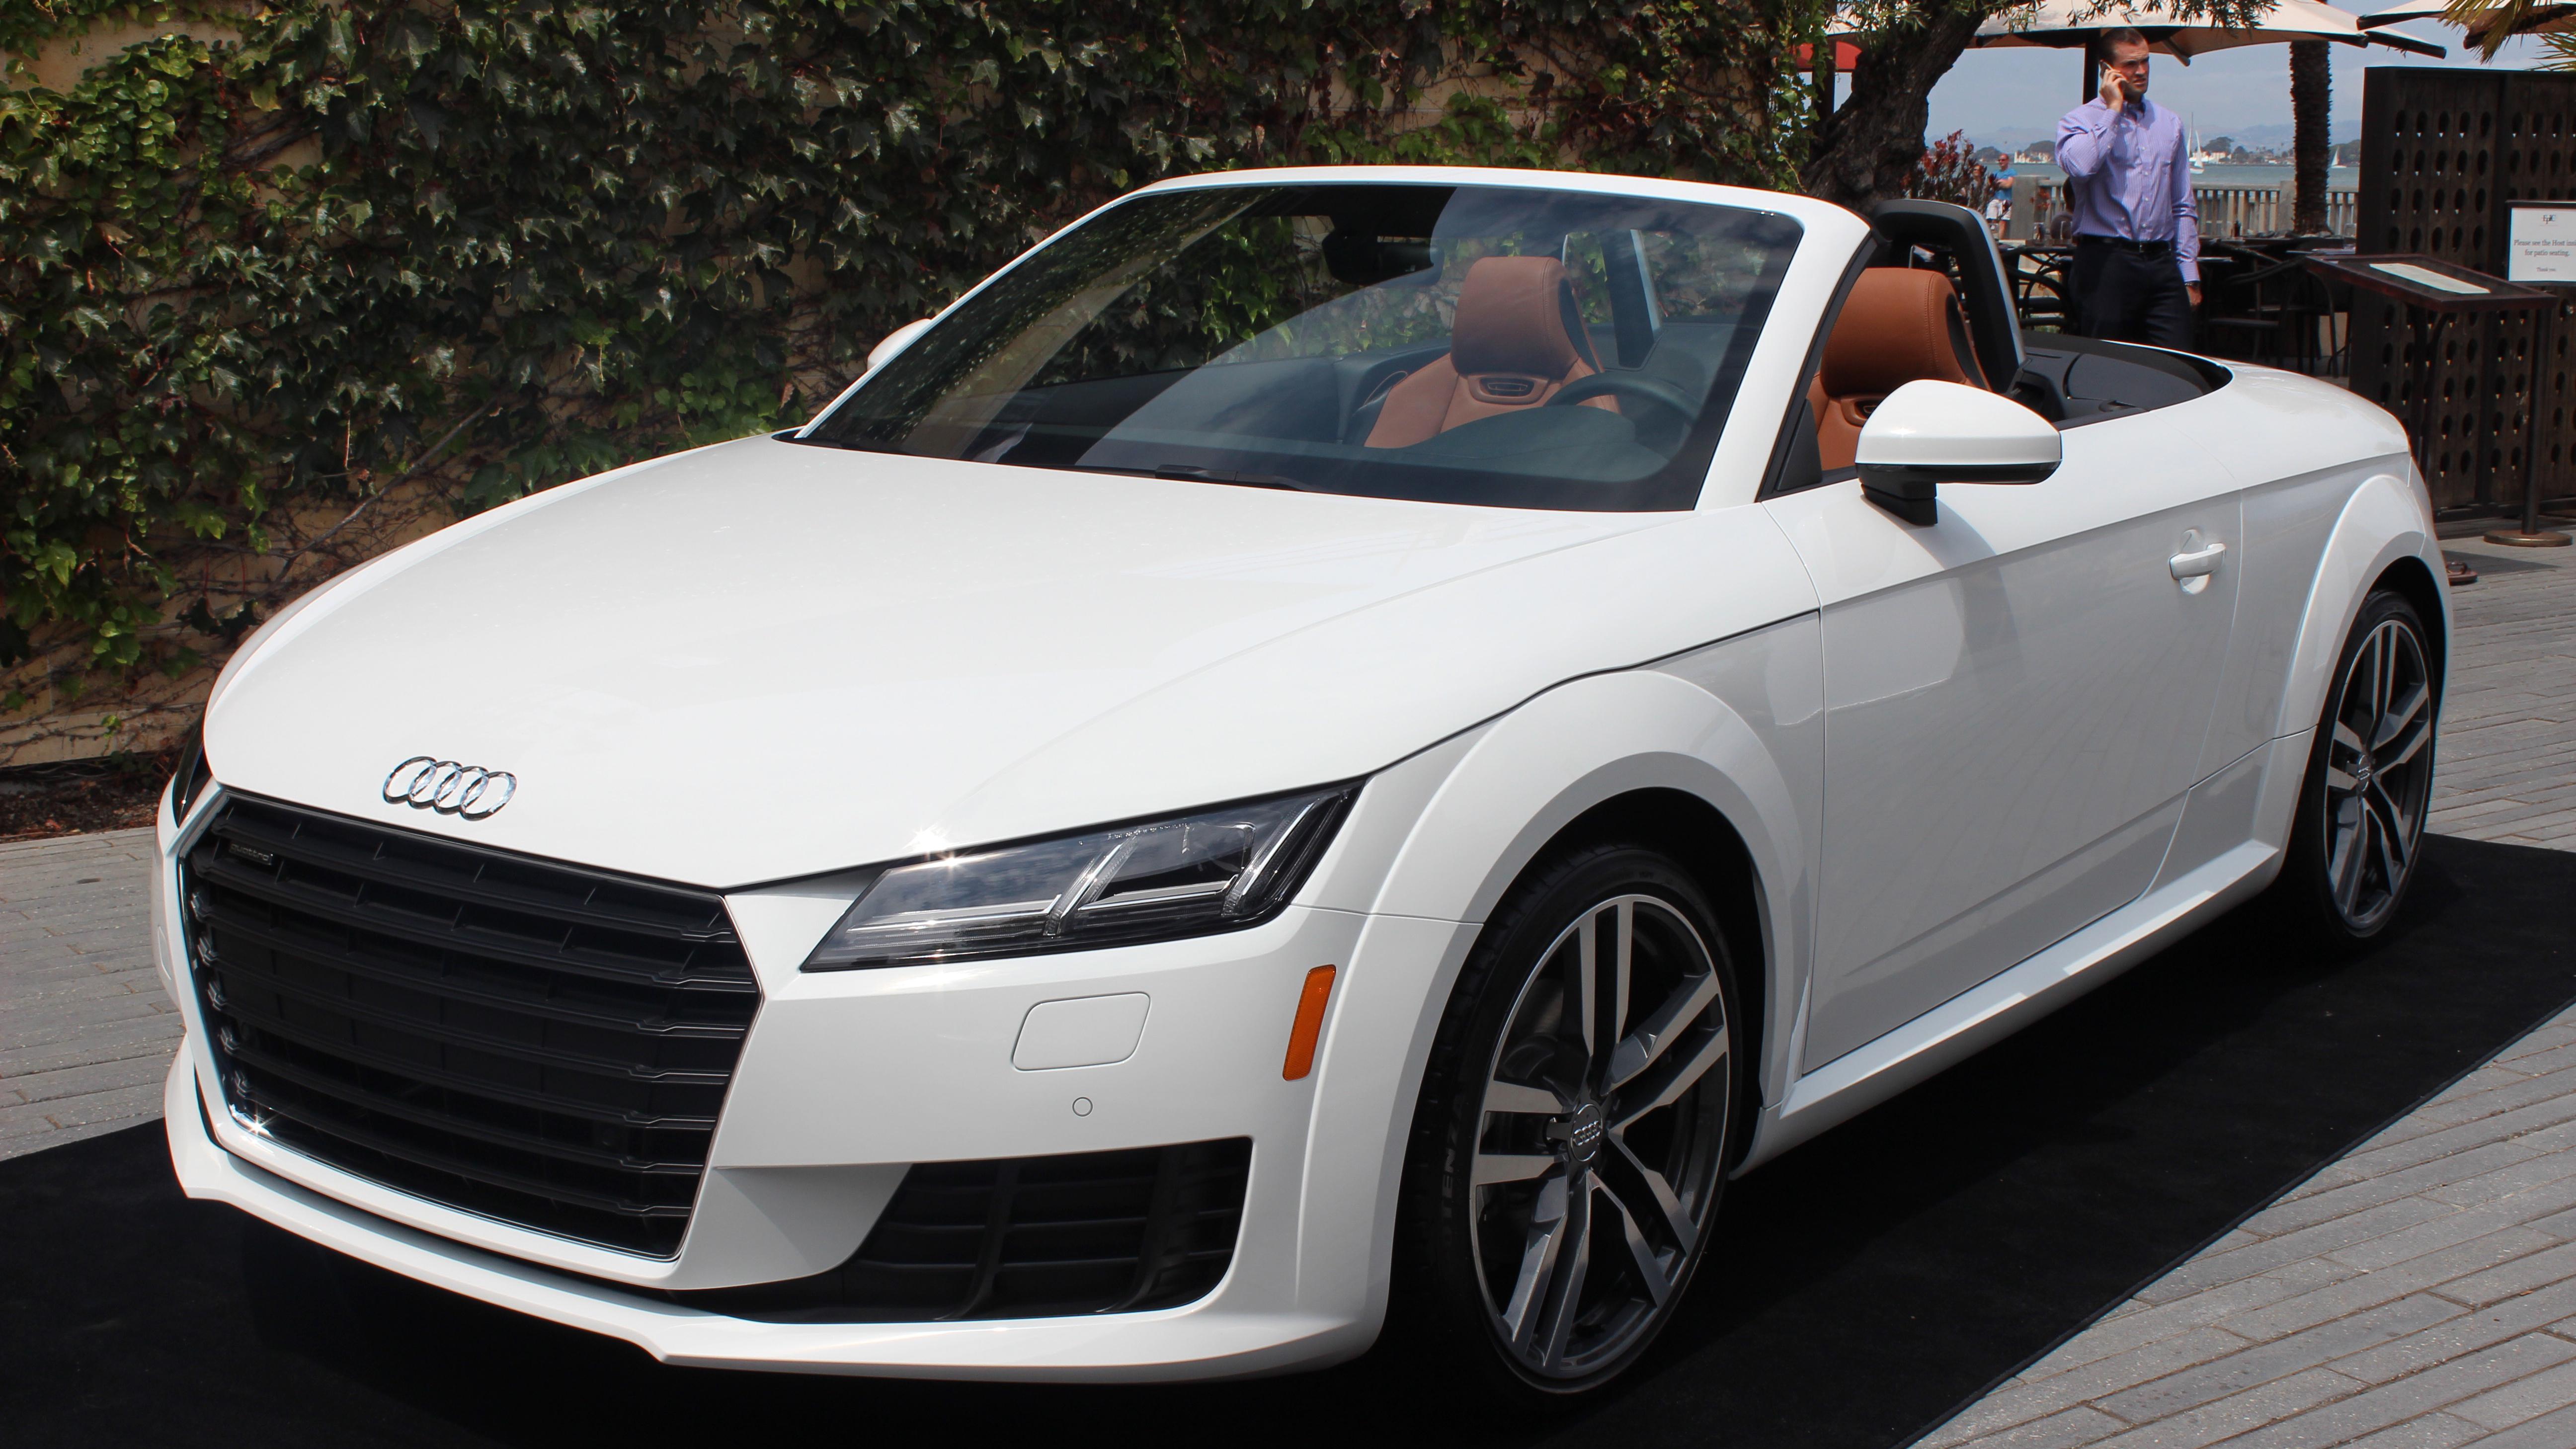 Audi's new all-digital cockpit kicks gauges to the curb